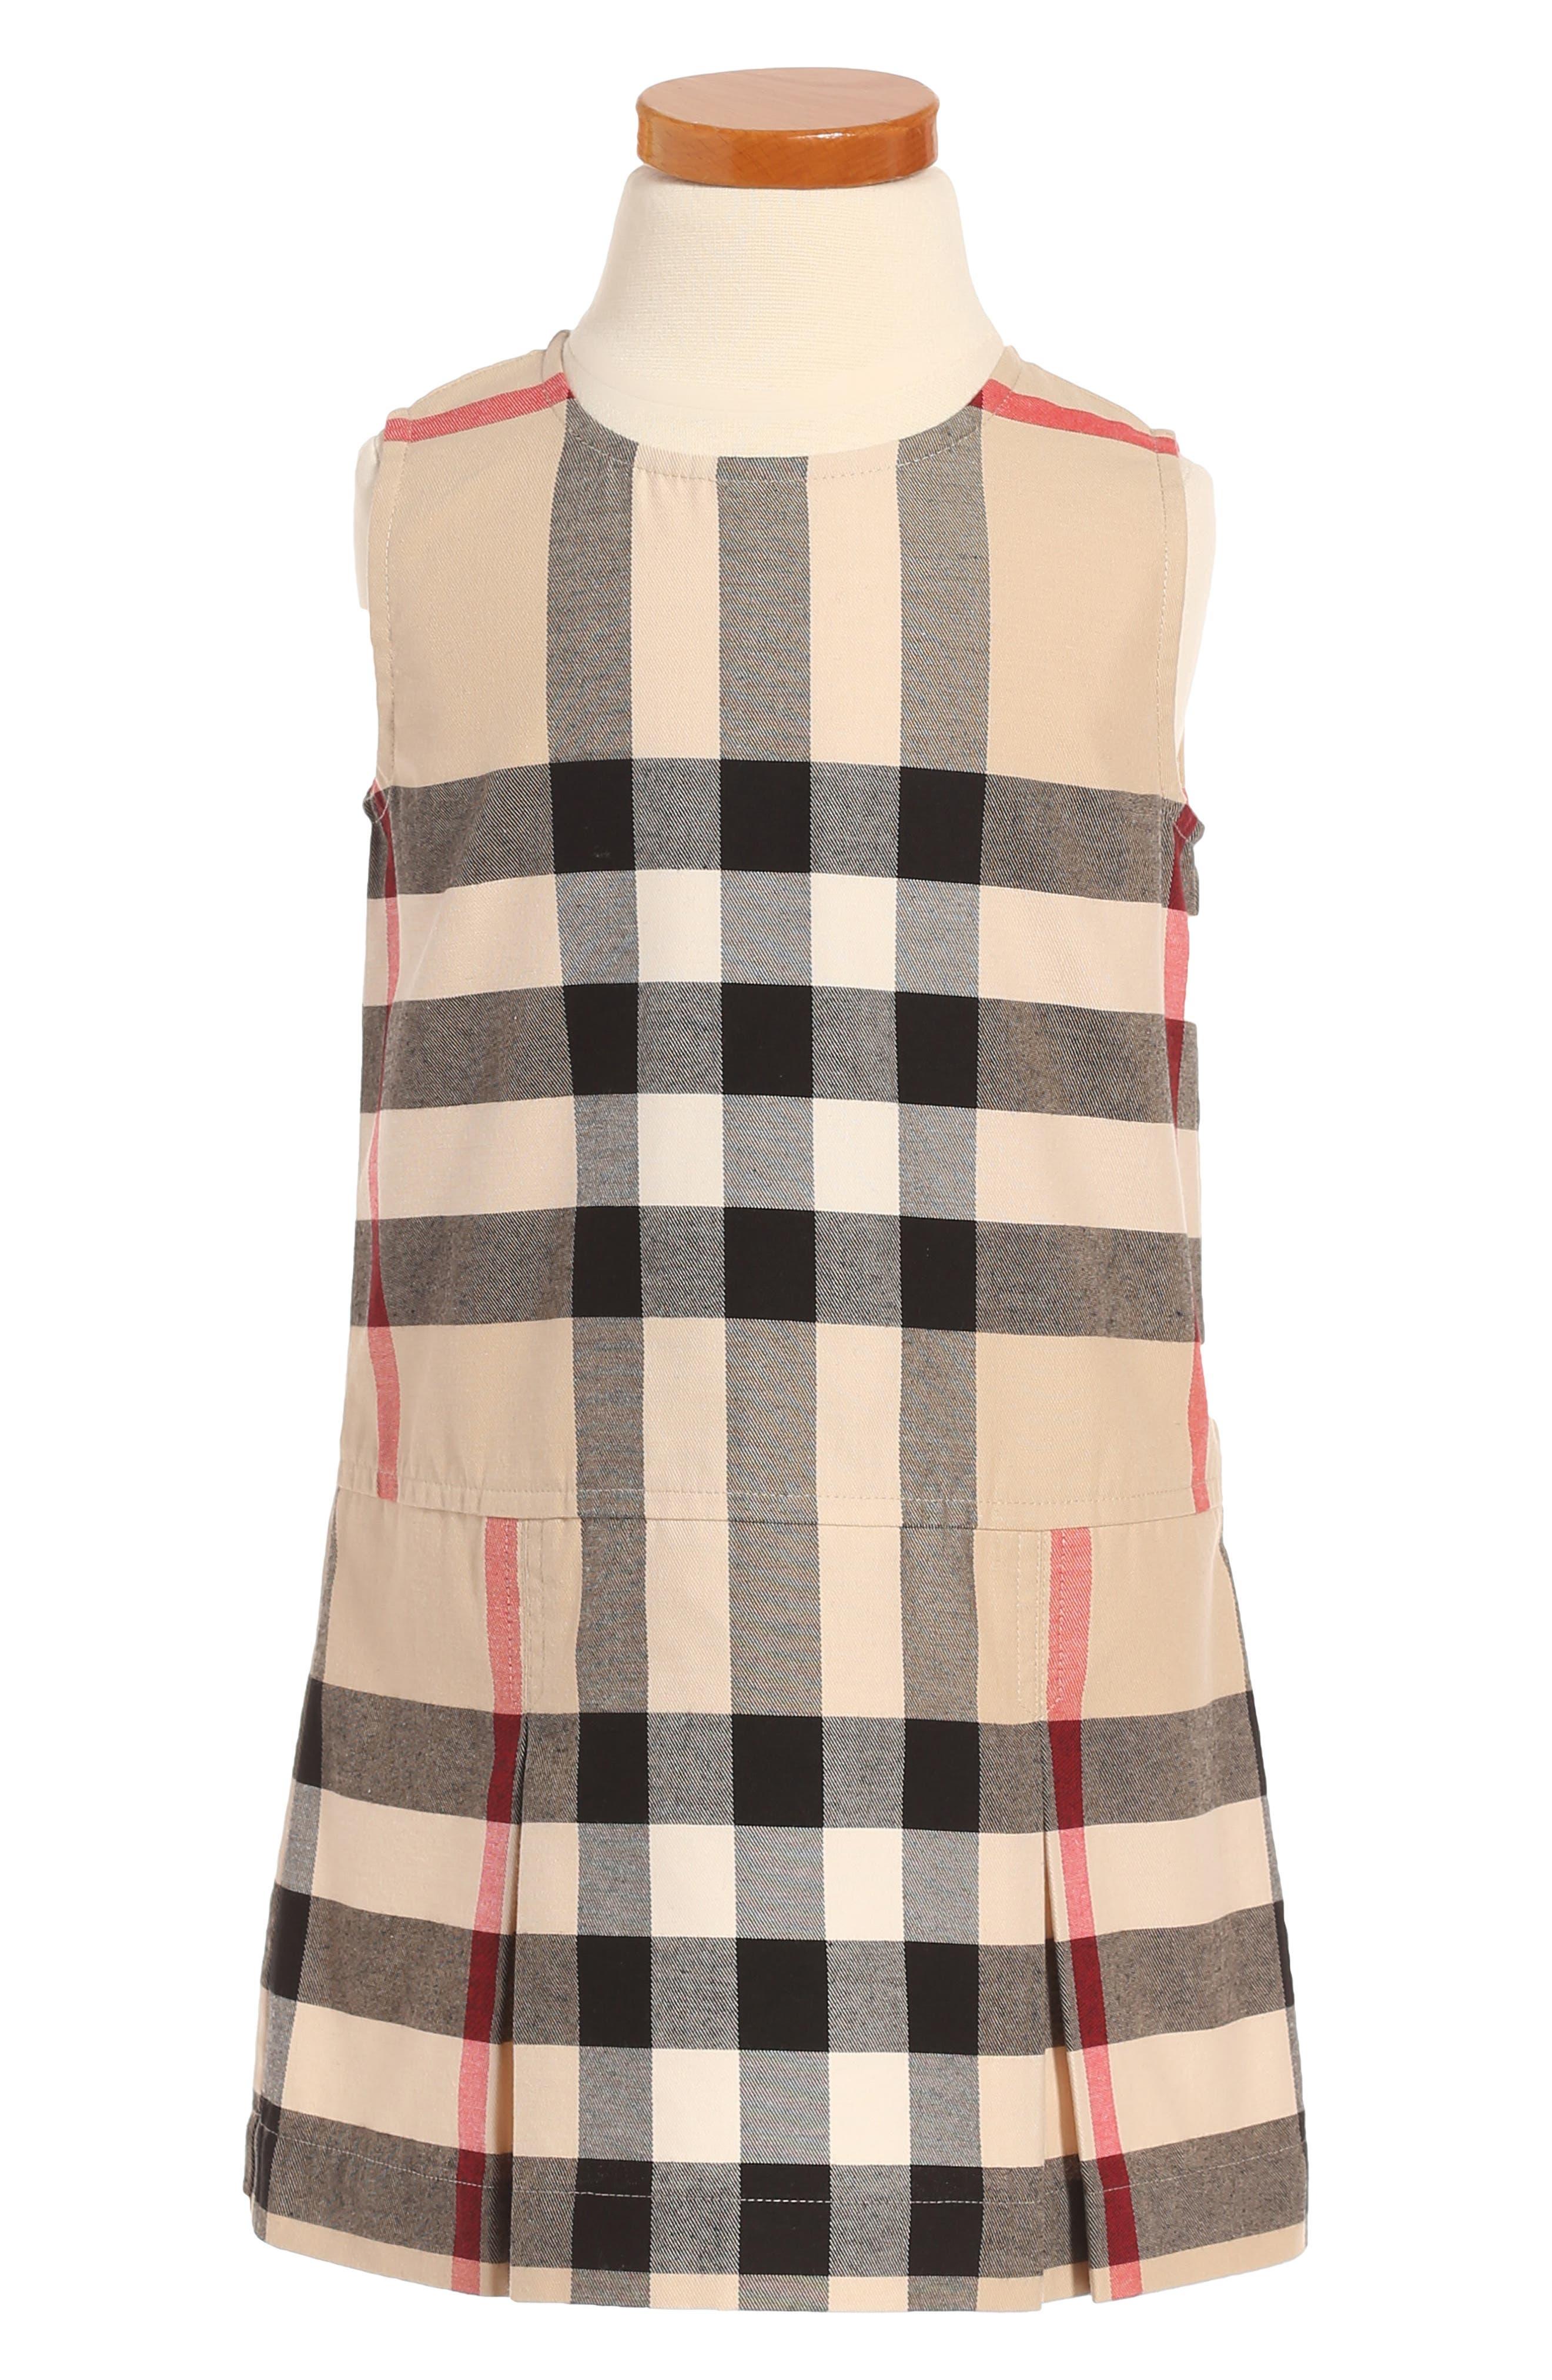 Alternate Image 1 Selected - Burberry Dawny Check Print Sleeveless Dress (Toddler Girls)